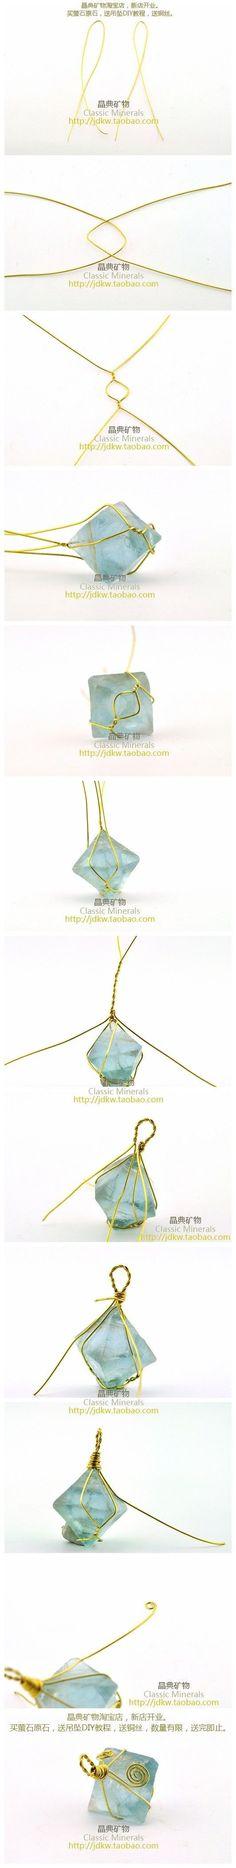 DIY Bijoux 20130429163138_MVV3Q.thumb.700_0.jpeg (5324211)